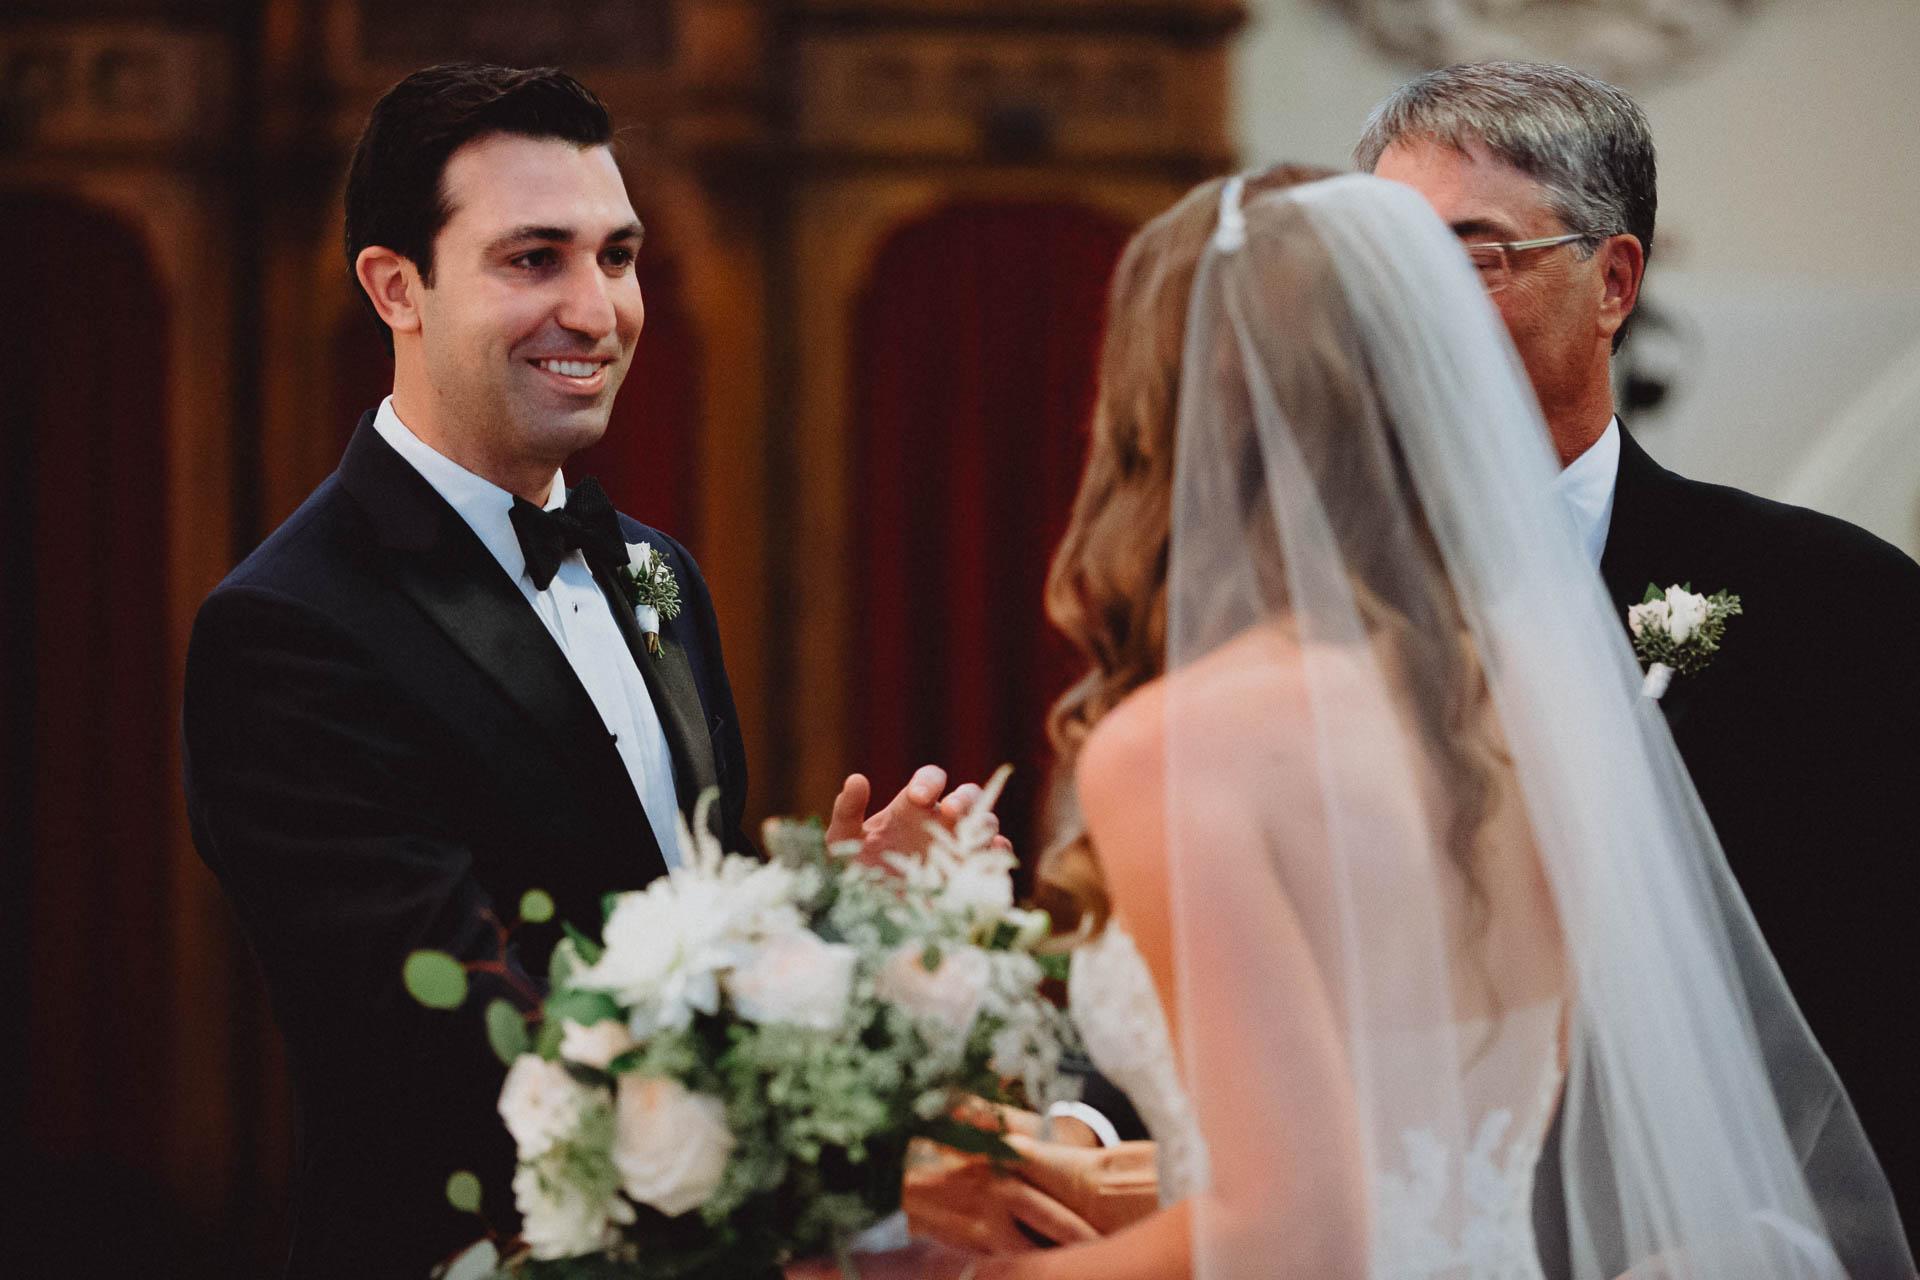 Keri-Joseph-Top-of-the-Market-Wedding-072@2x.jpg